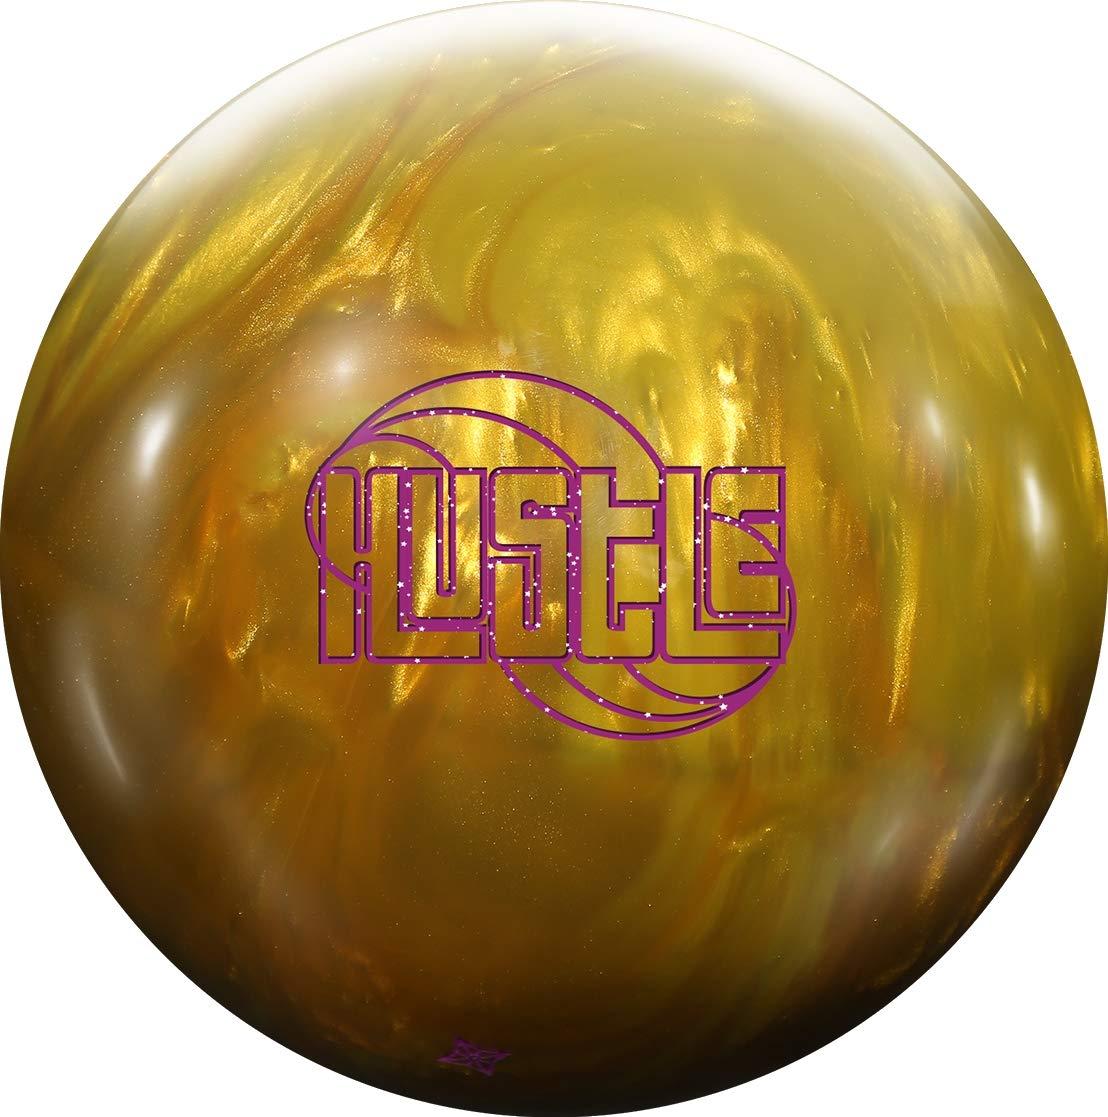 Roto Grip Hustle ボーリングボール ゴールドパール B07PQMTBPR  16